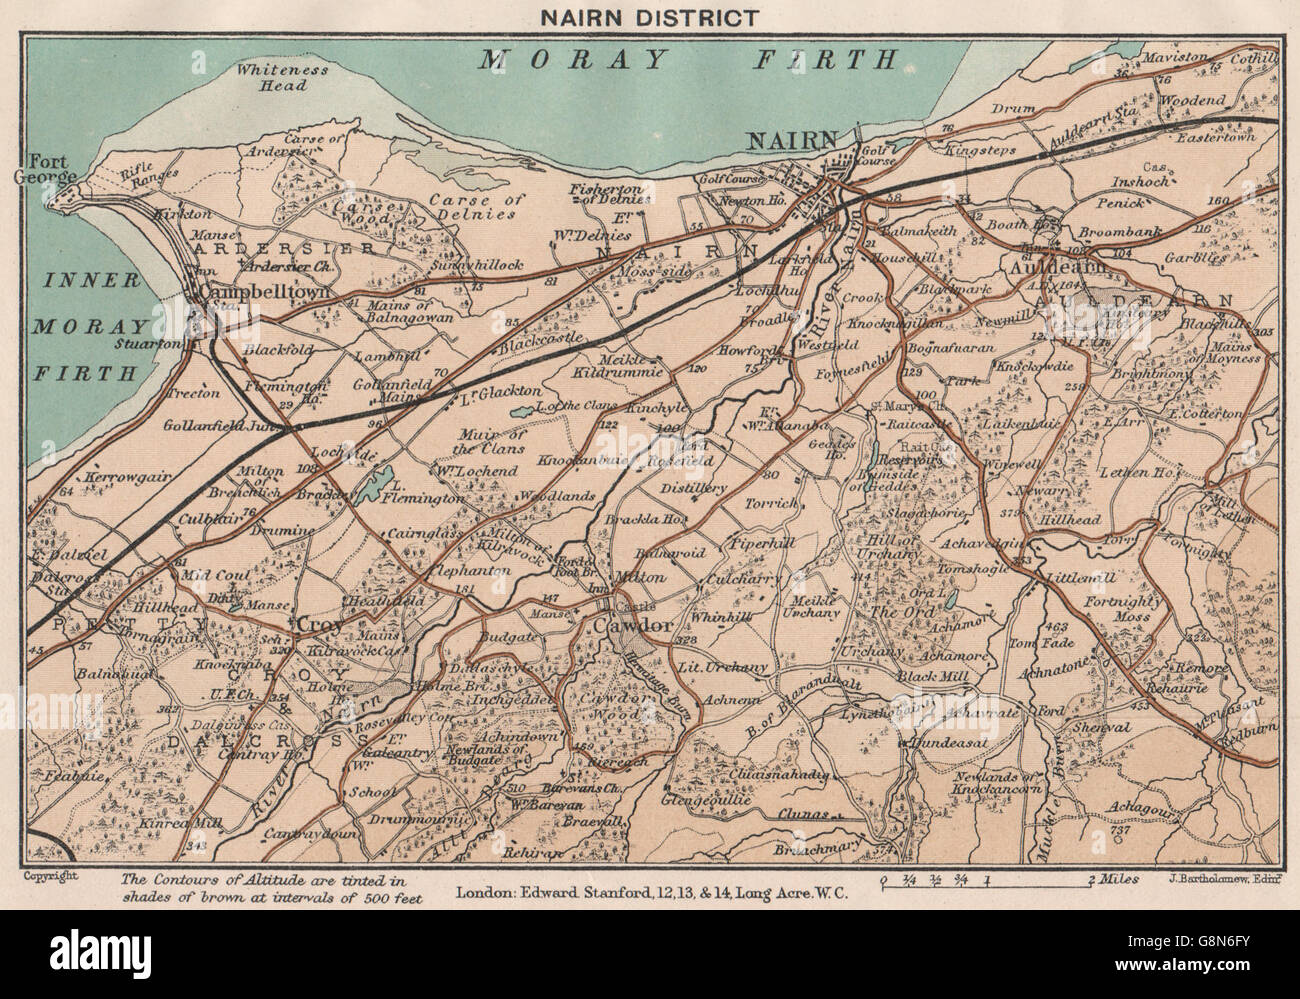 Nairn Scotland Map.Nairn District Campbelltown Vintage Map Scotland Stanford 1905